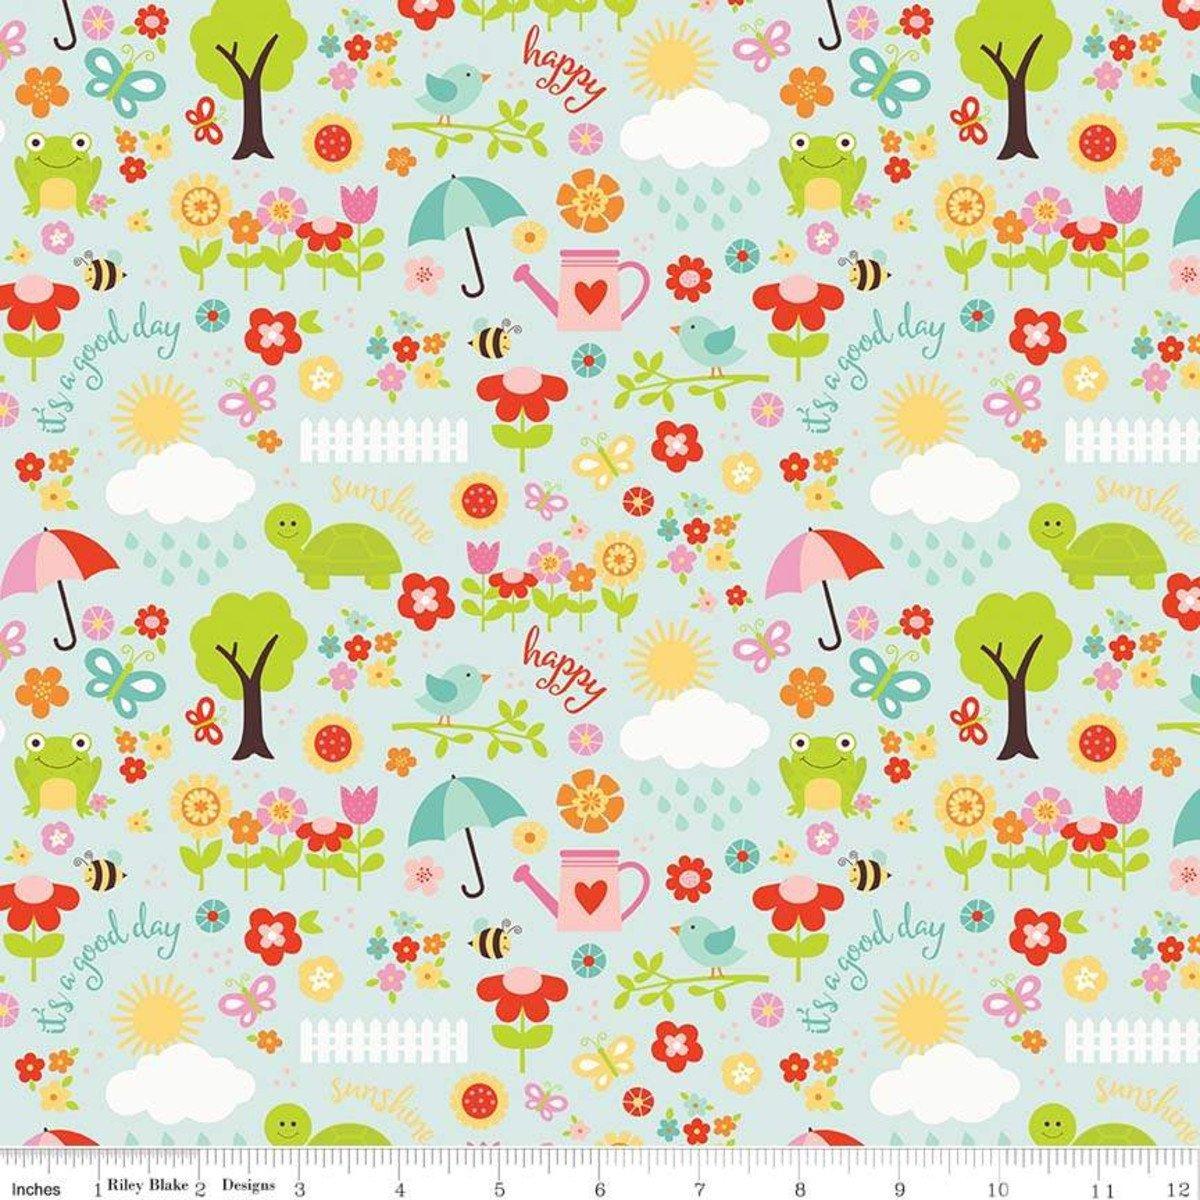 Bloom April Showers Flannel